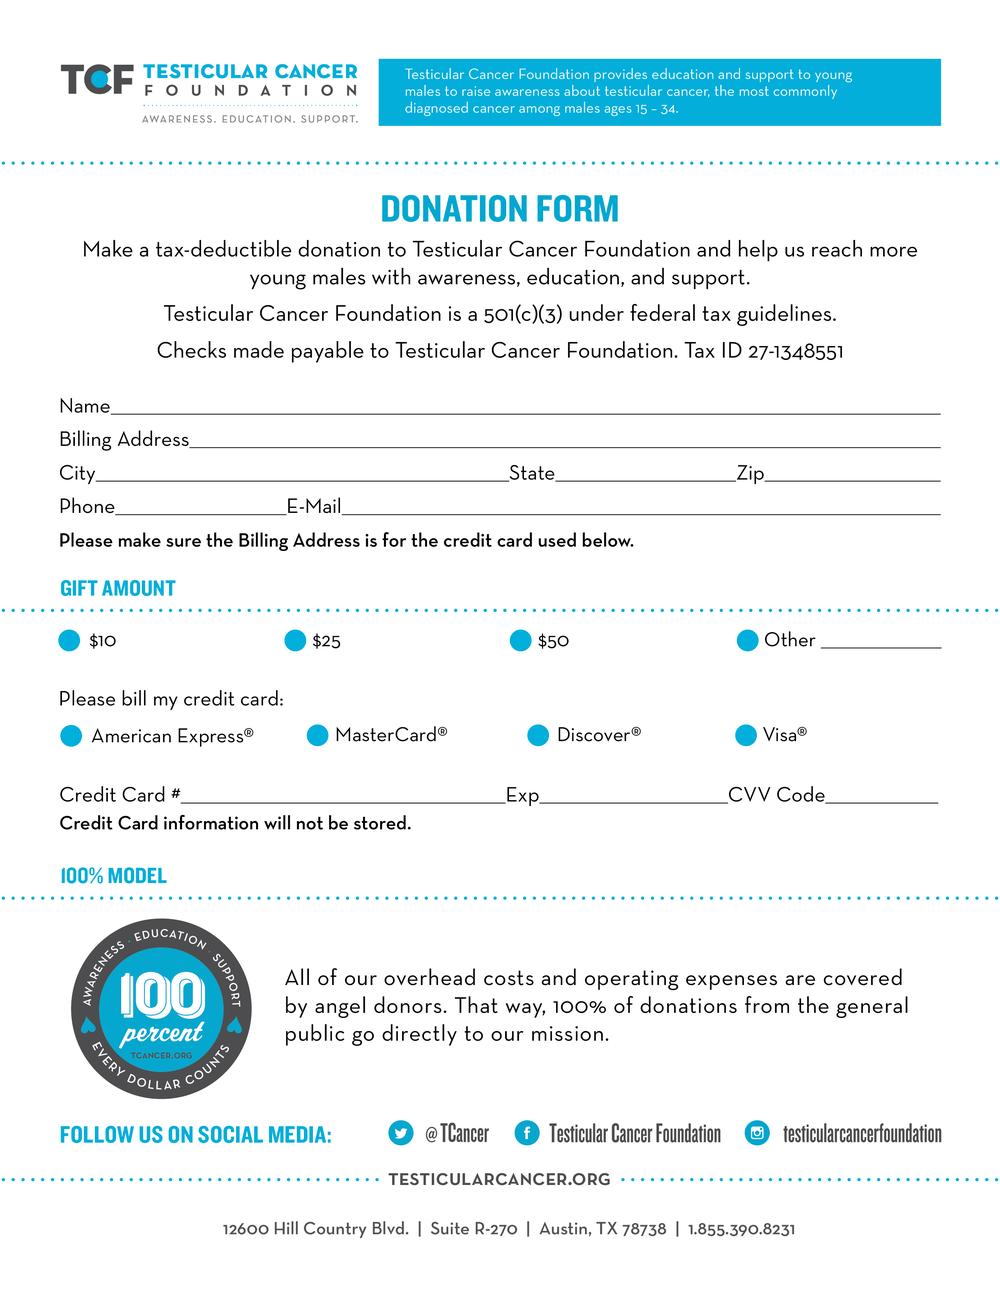 TCF-DonationFormUpdate.png